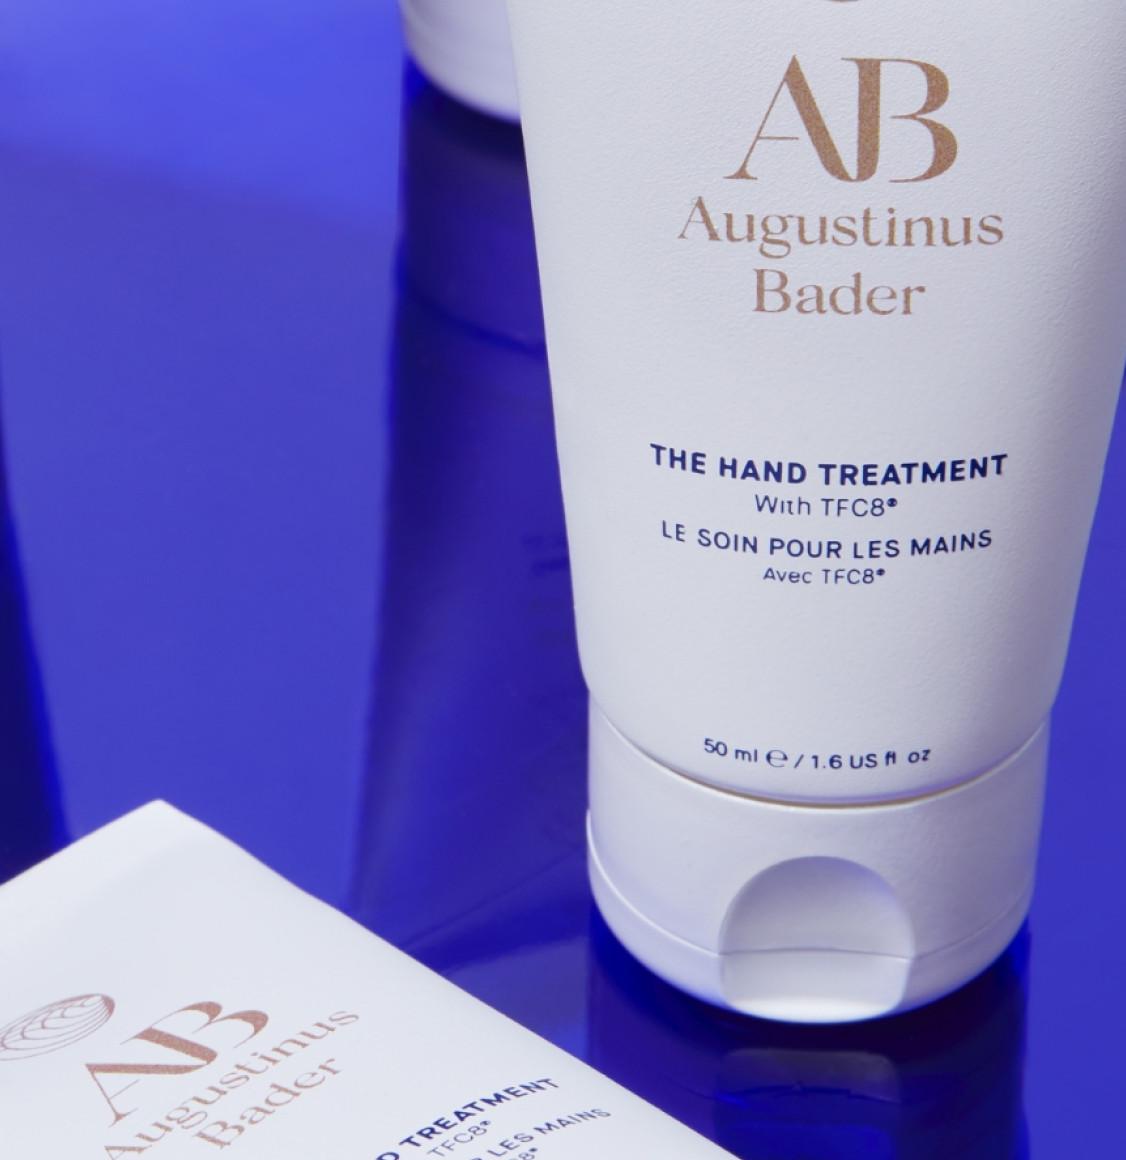 Augustinus Bader Κρέμα Περιποίησης Χεριών The Hand Treatment Cream 50ml